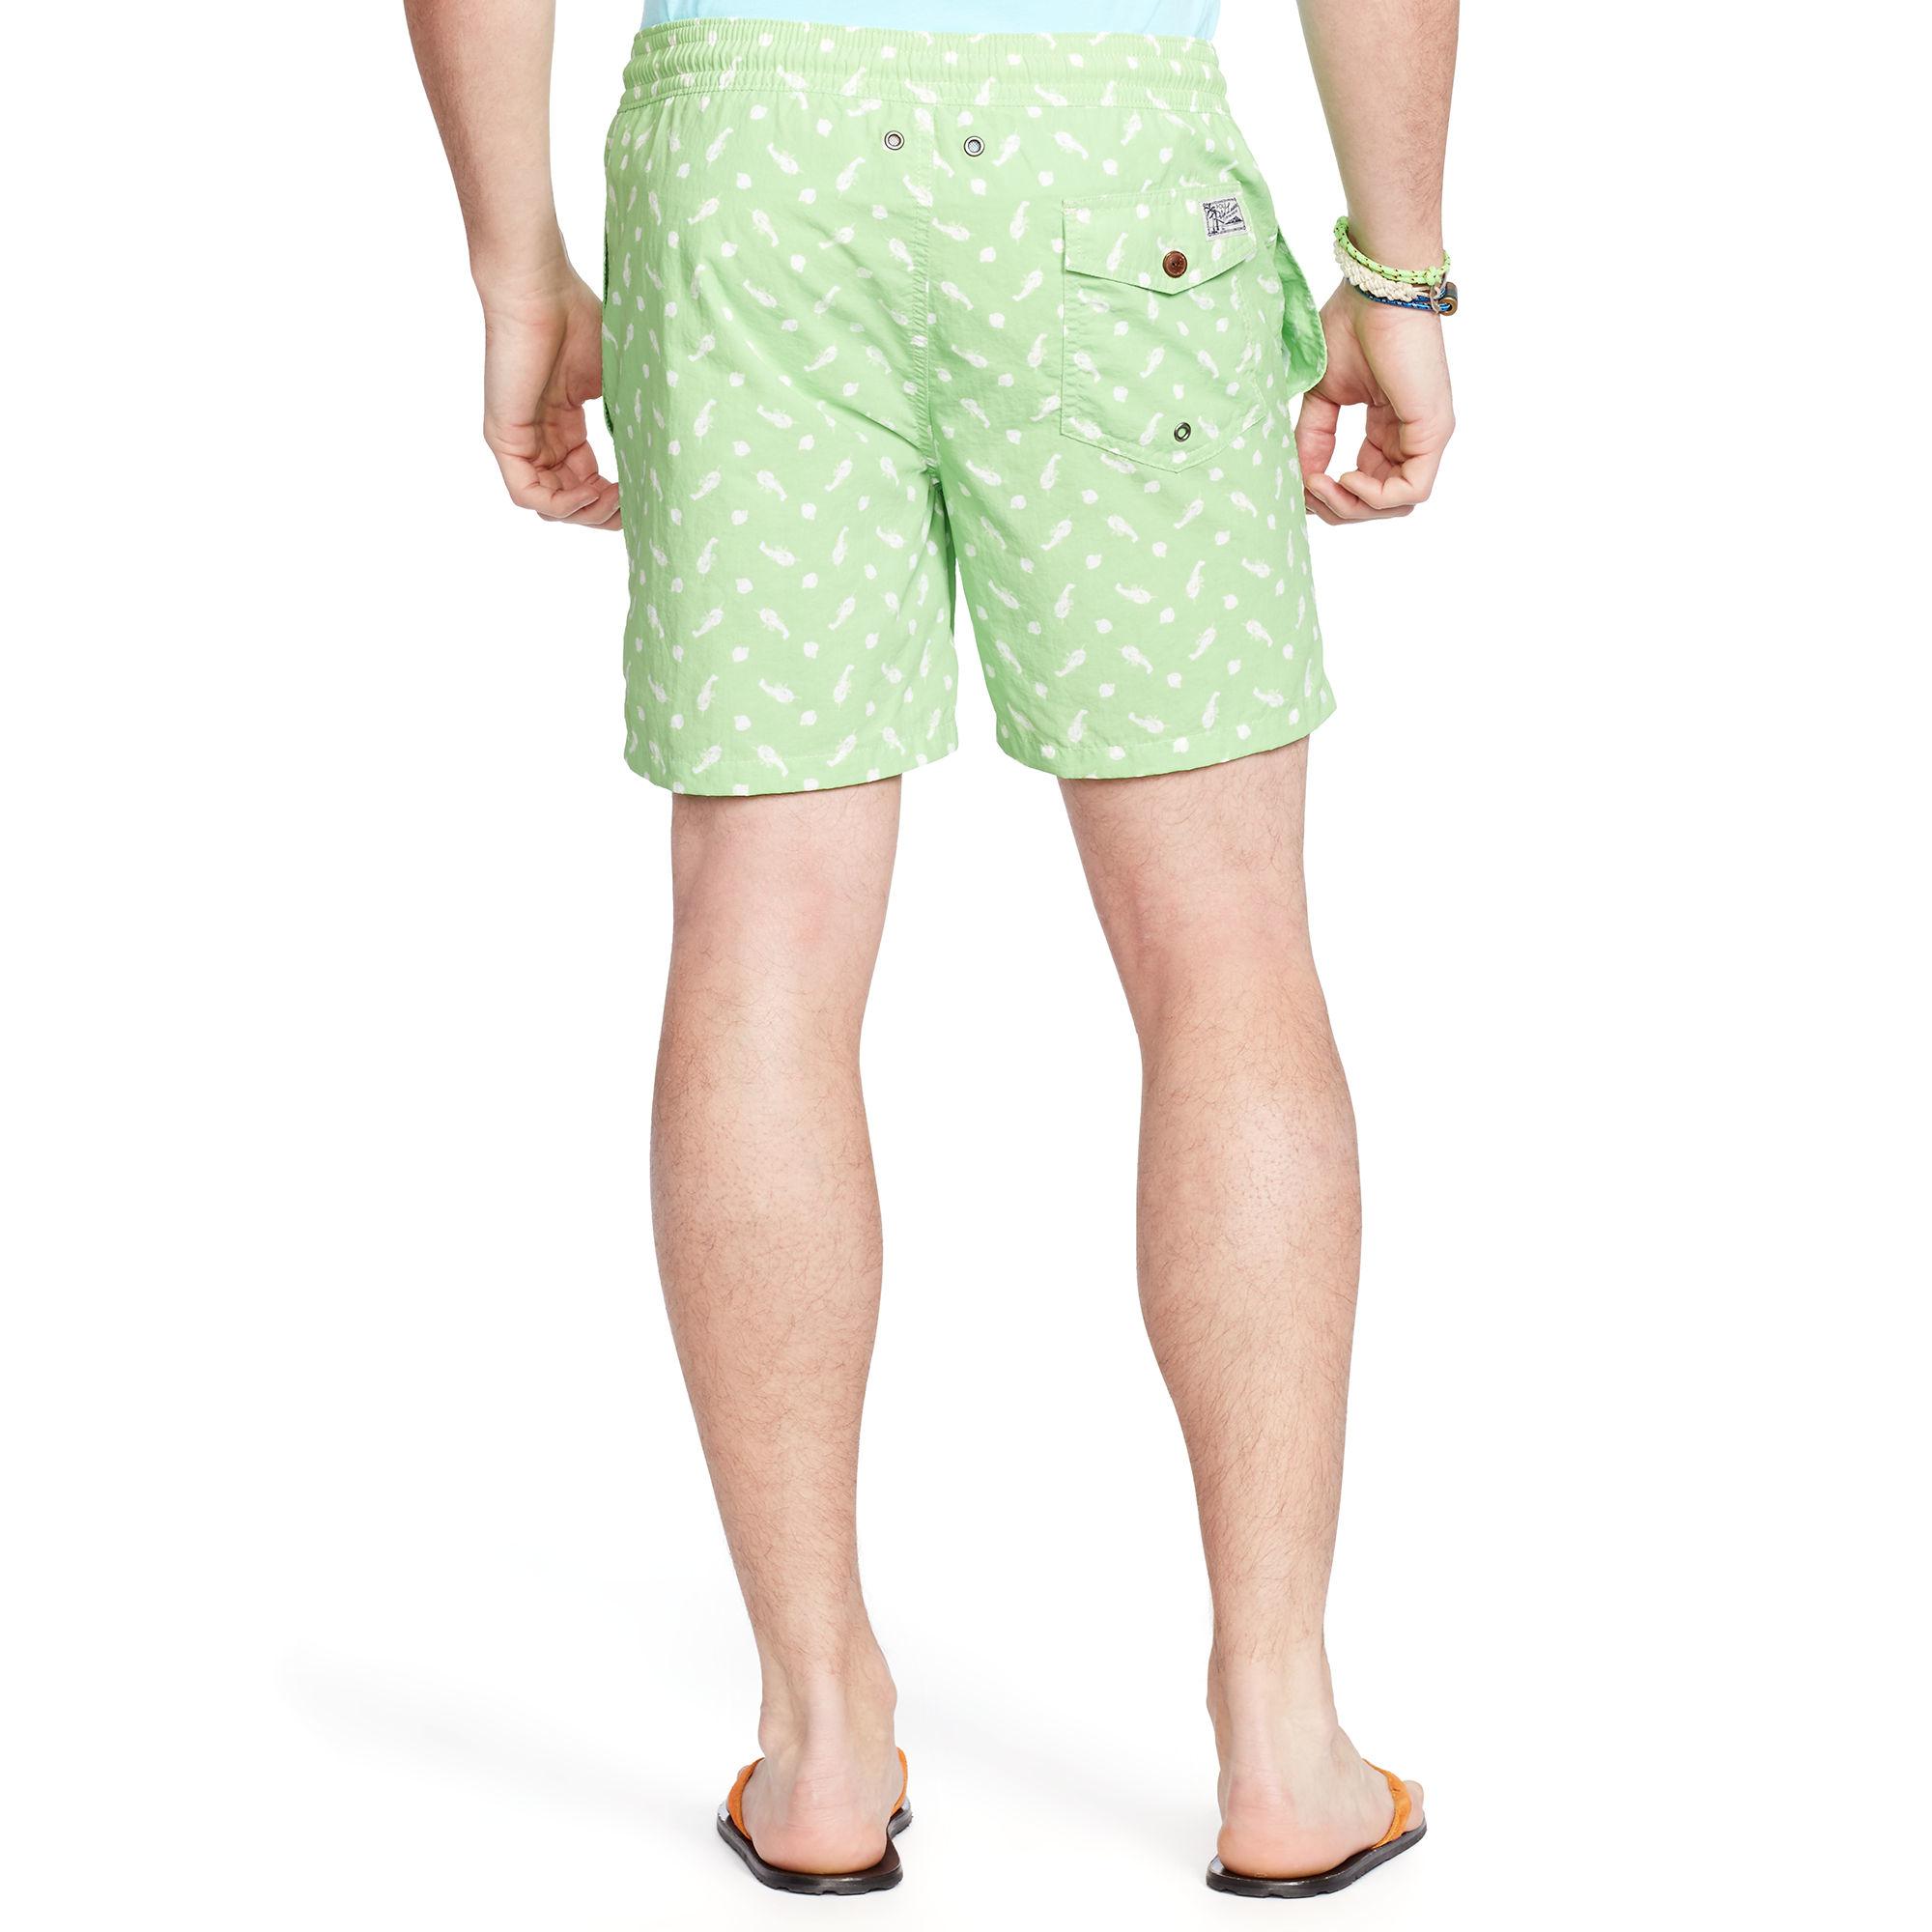 lyst polo ralph lauren badeshorts traveler in green for men. Black Bedroom Furniture Sets. Home Design Ideas